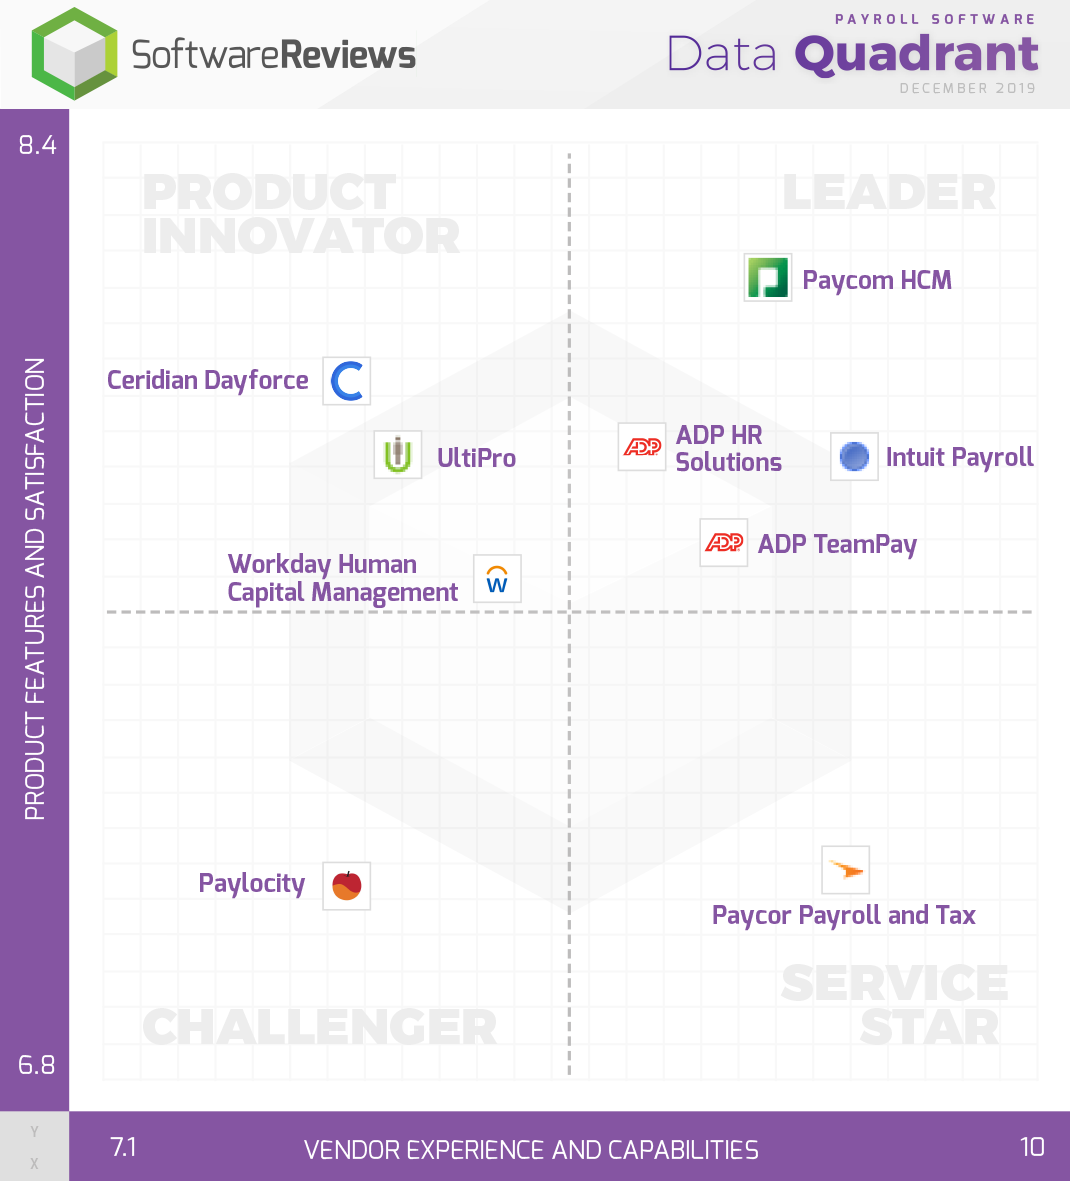 Payroll Software Data Quadrant